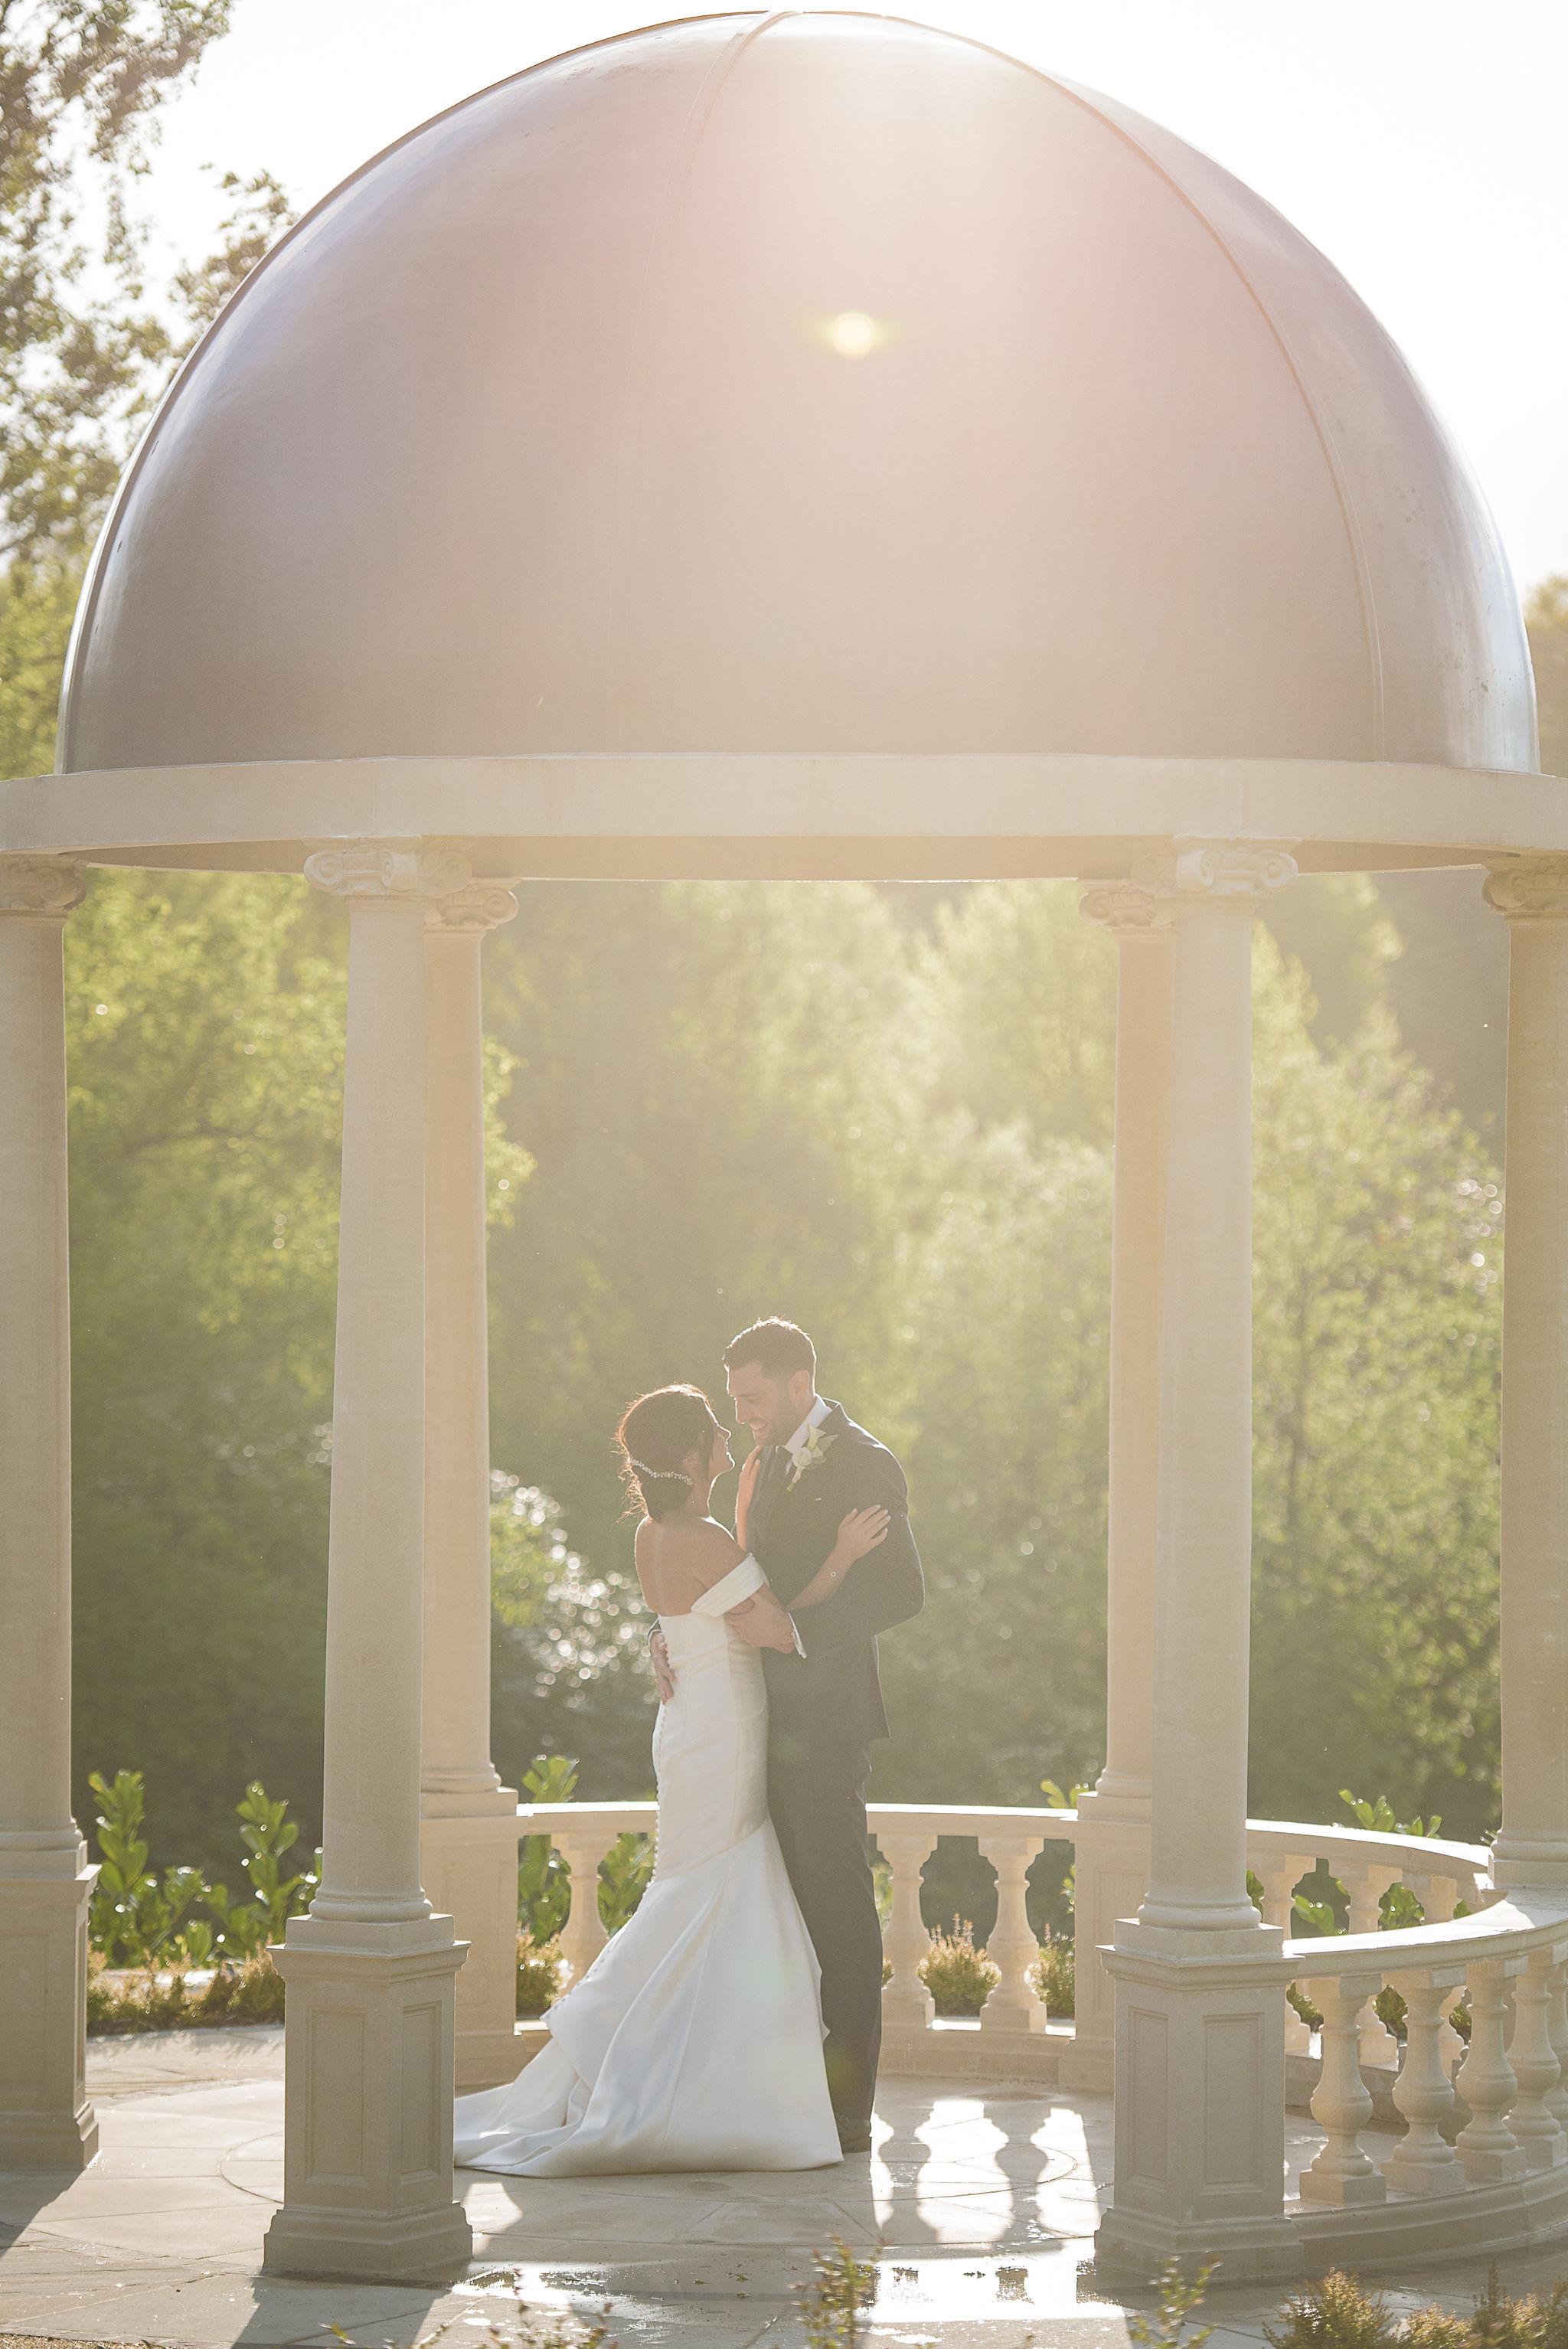 wedding-photography-natural-soft-lighting-makeup-and-hair-Jo-Elizabeth-weddings-London